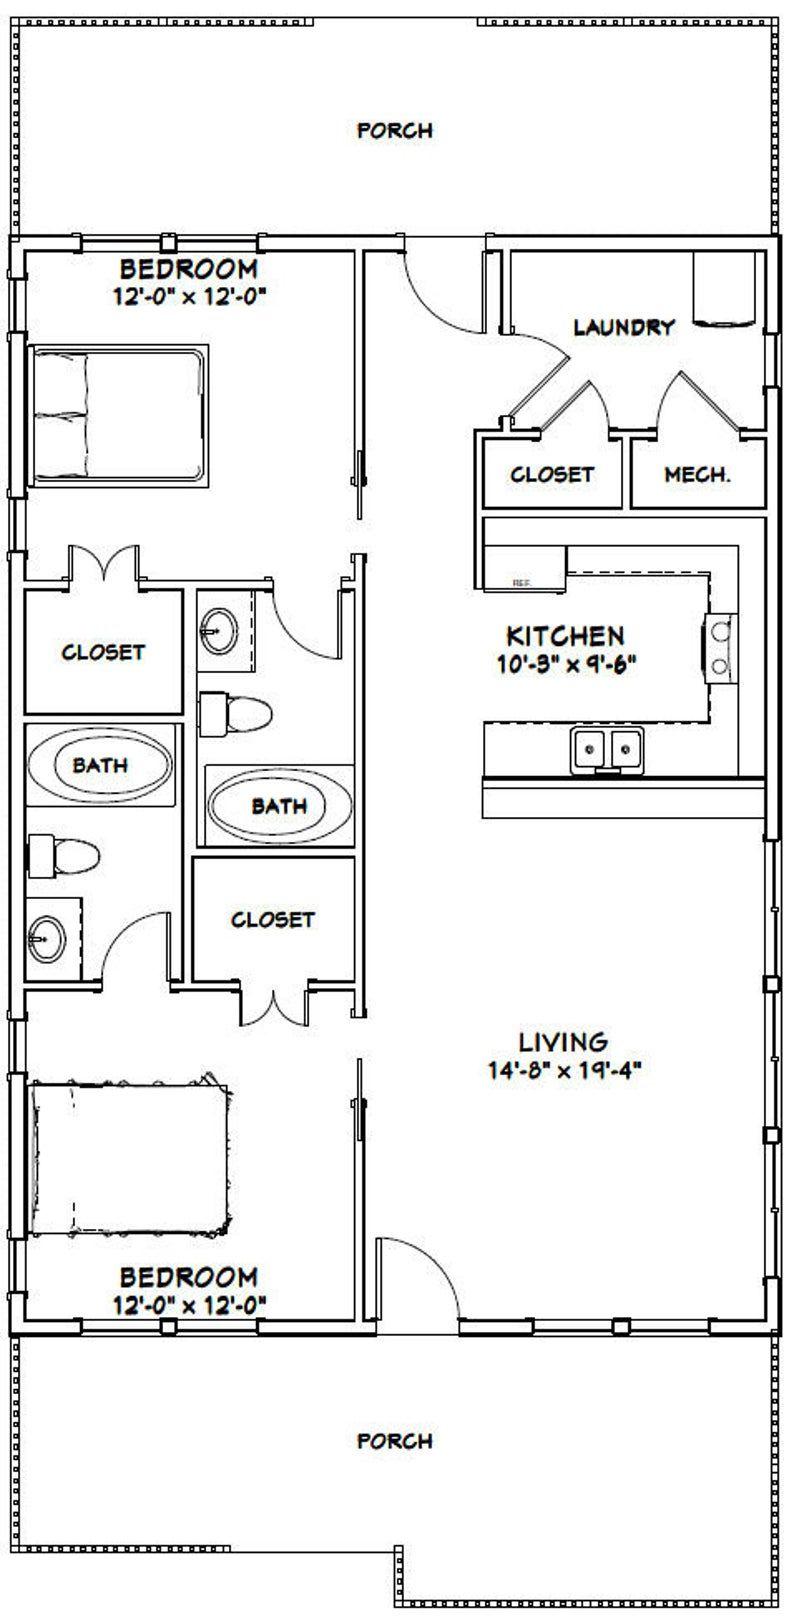 28x40 House 2 Bedroom 2 Bath 1 120 Sq Ft Pdf Floor Plan Instant Download Model 2 In 2020 Small Floor Plans House Plans Floor Plans